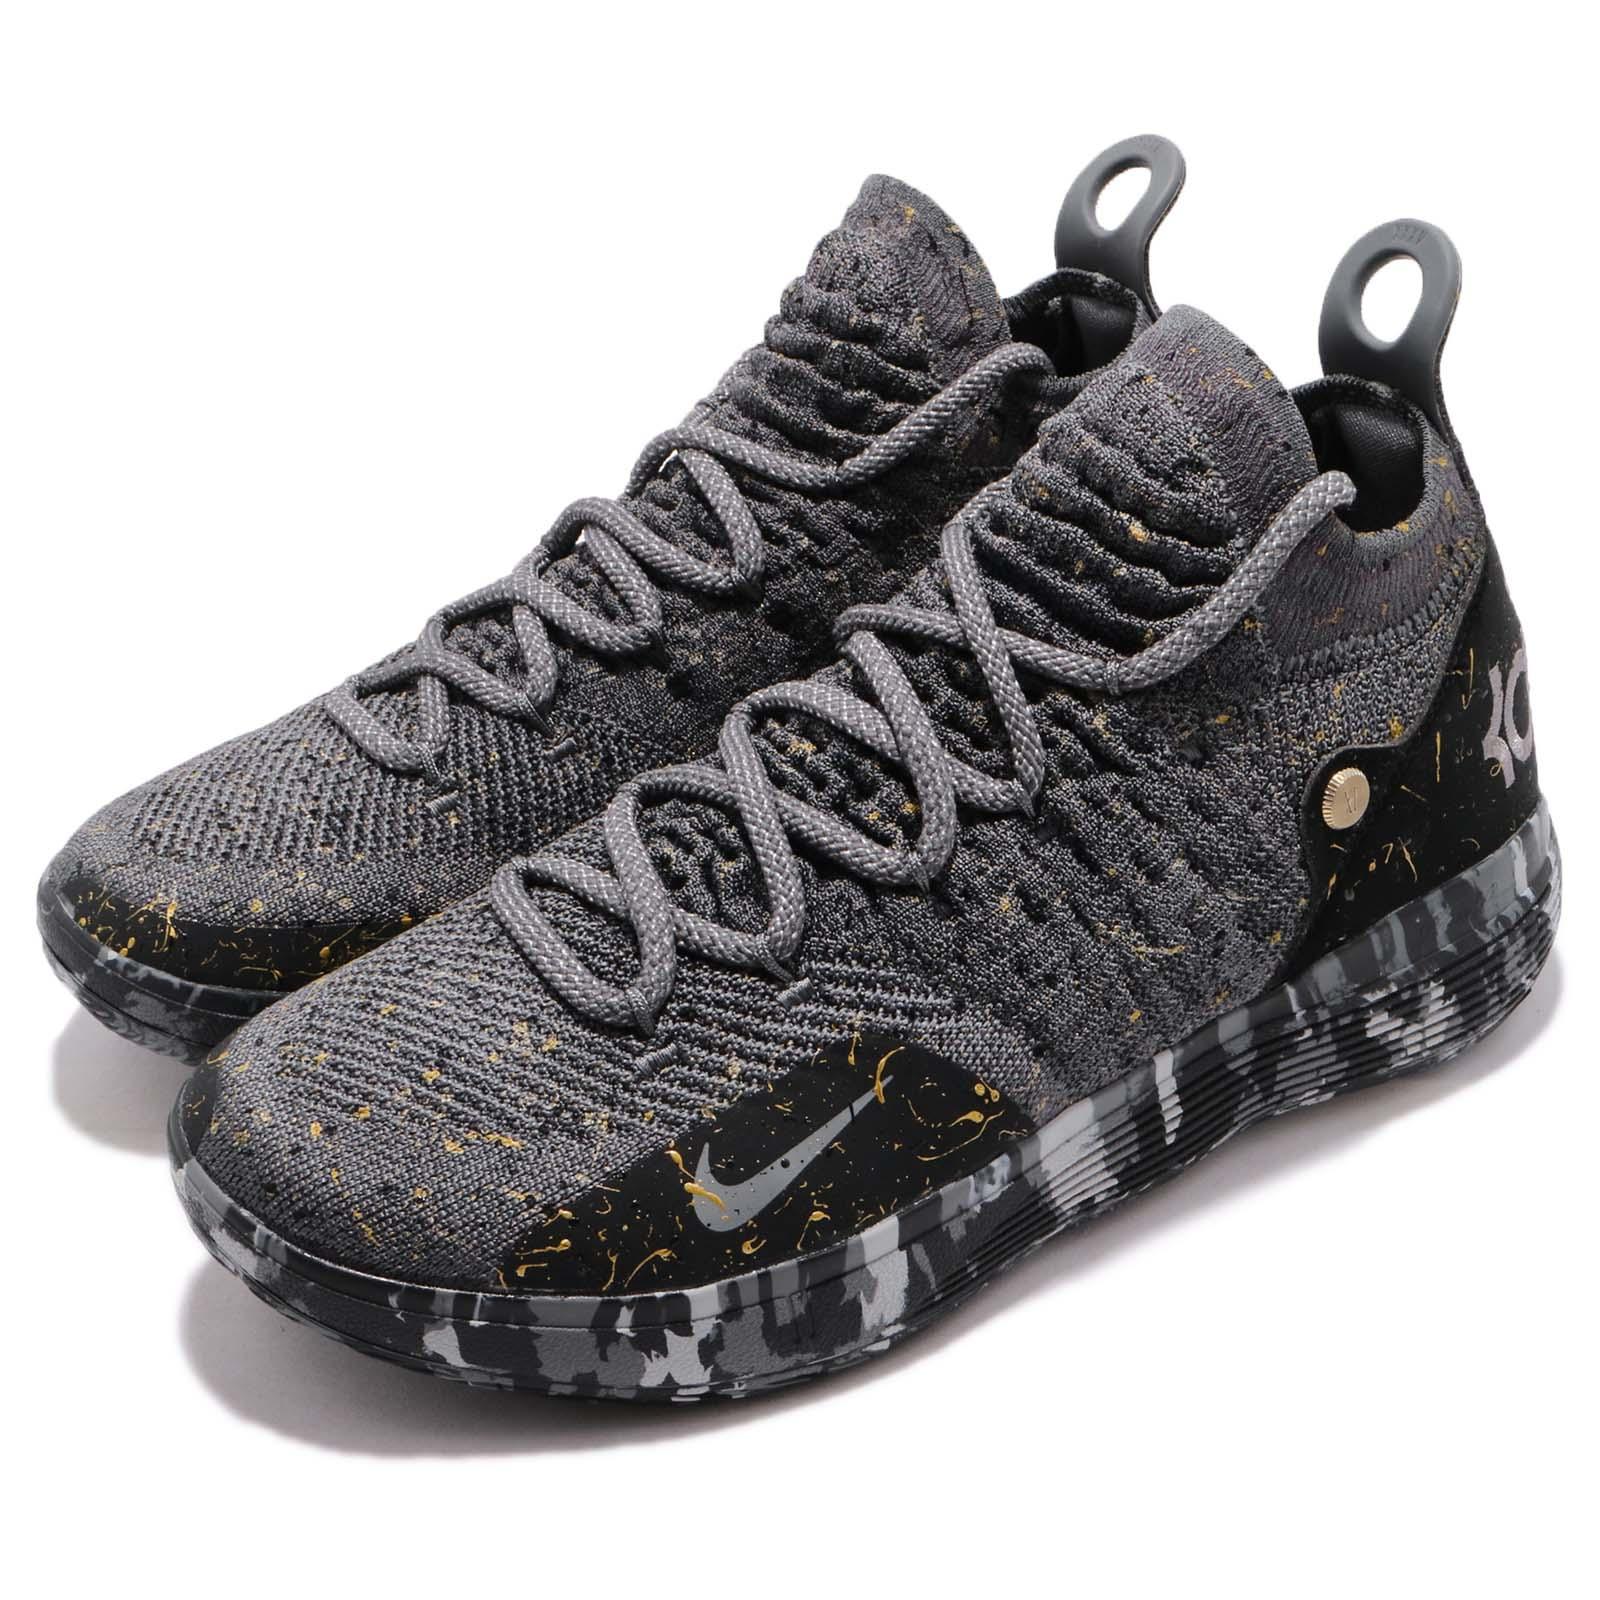 Nike 籃球鞋 Zoom KD11 低筒 男鞋 AO2605-901